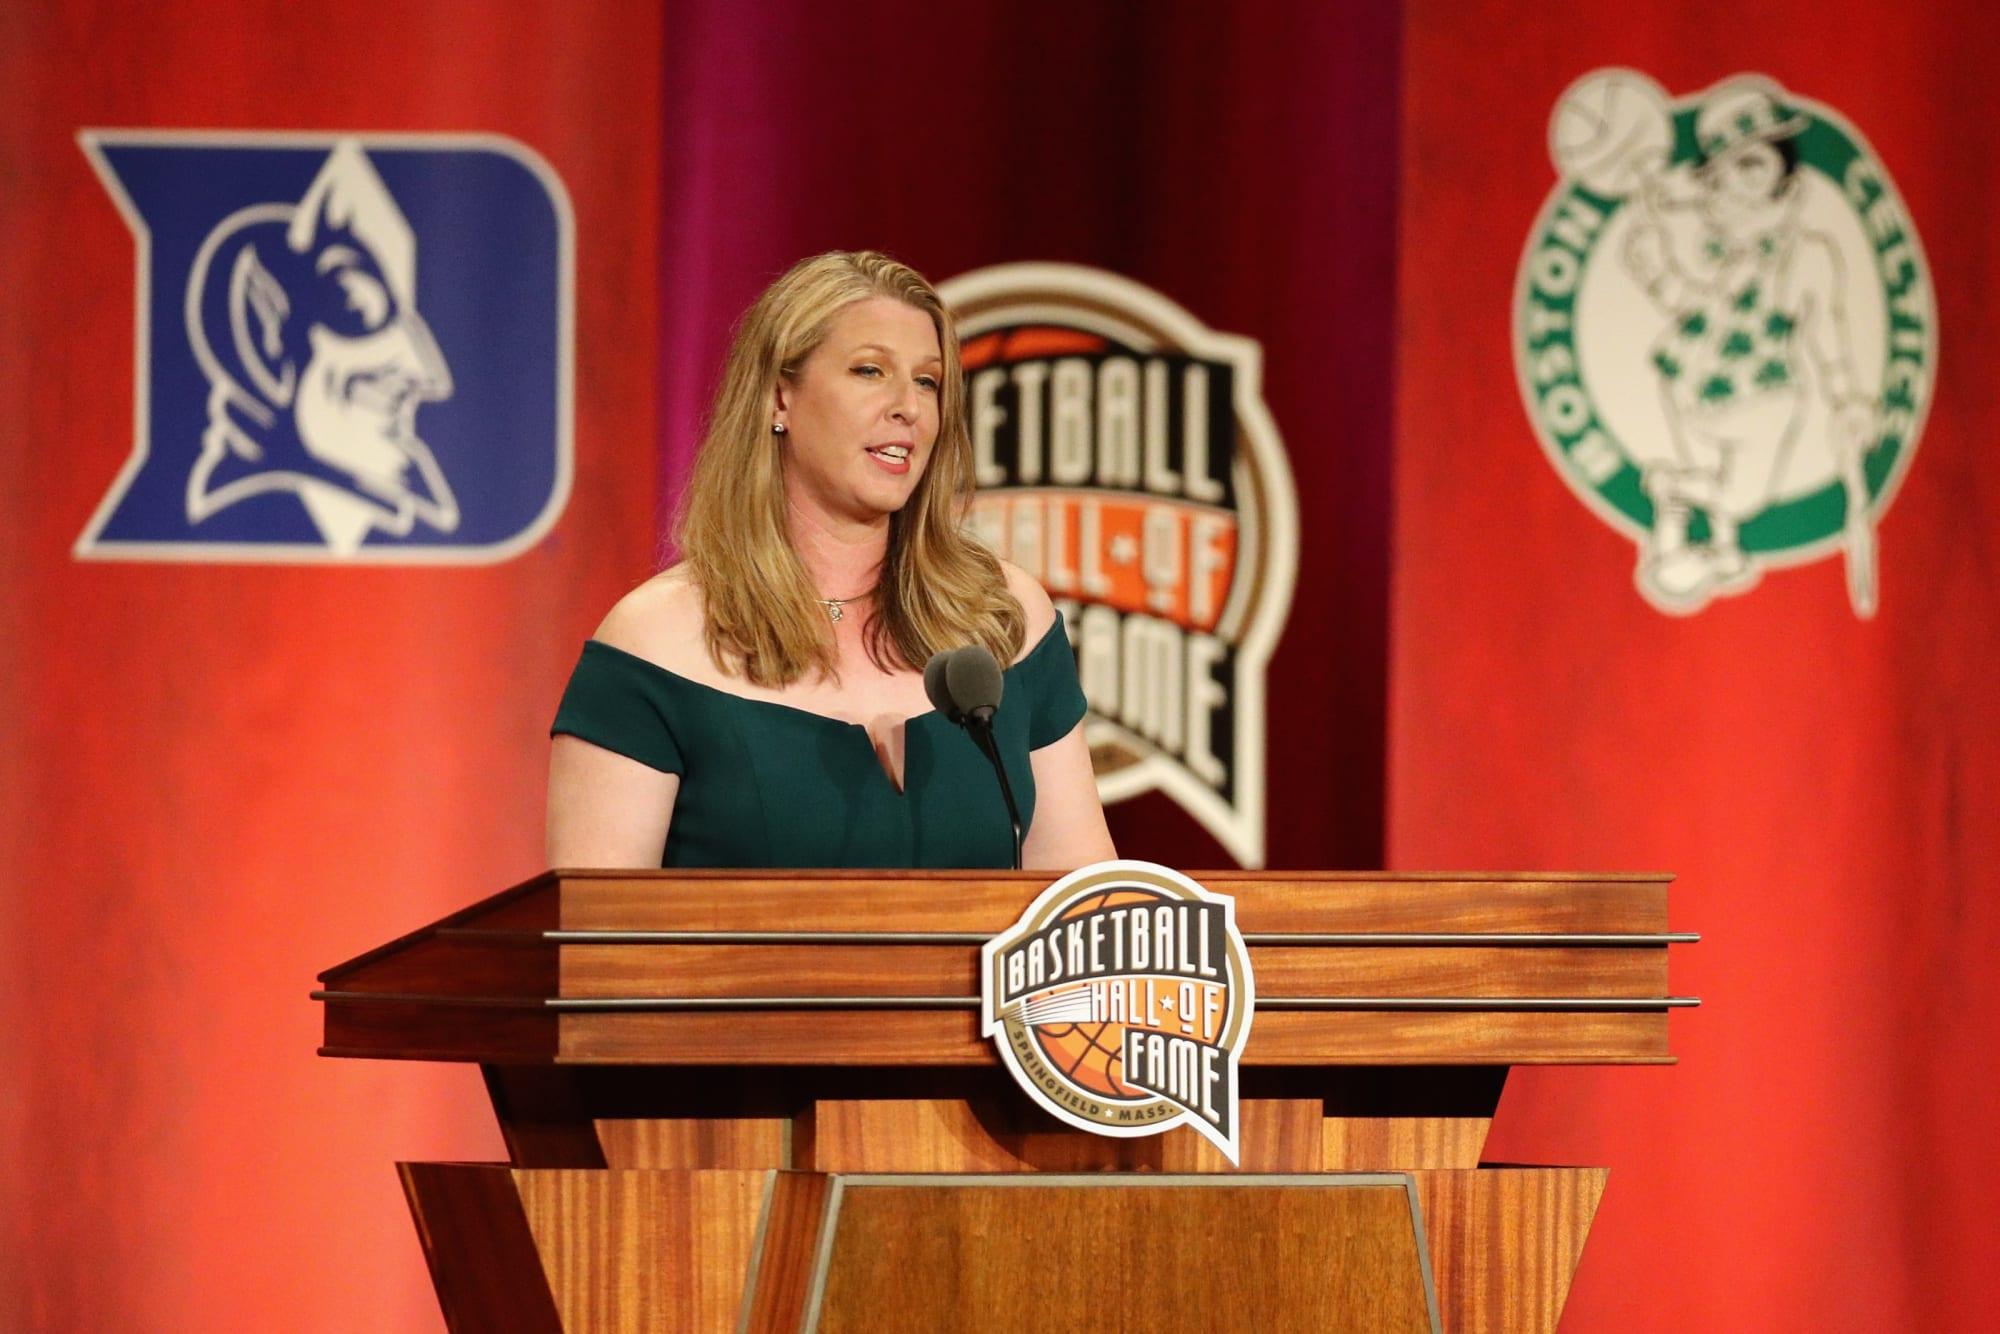 Katie Smith distributes sports equipment to Columbus families